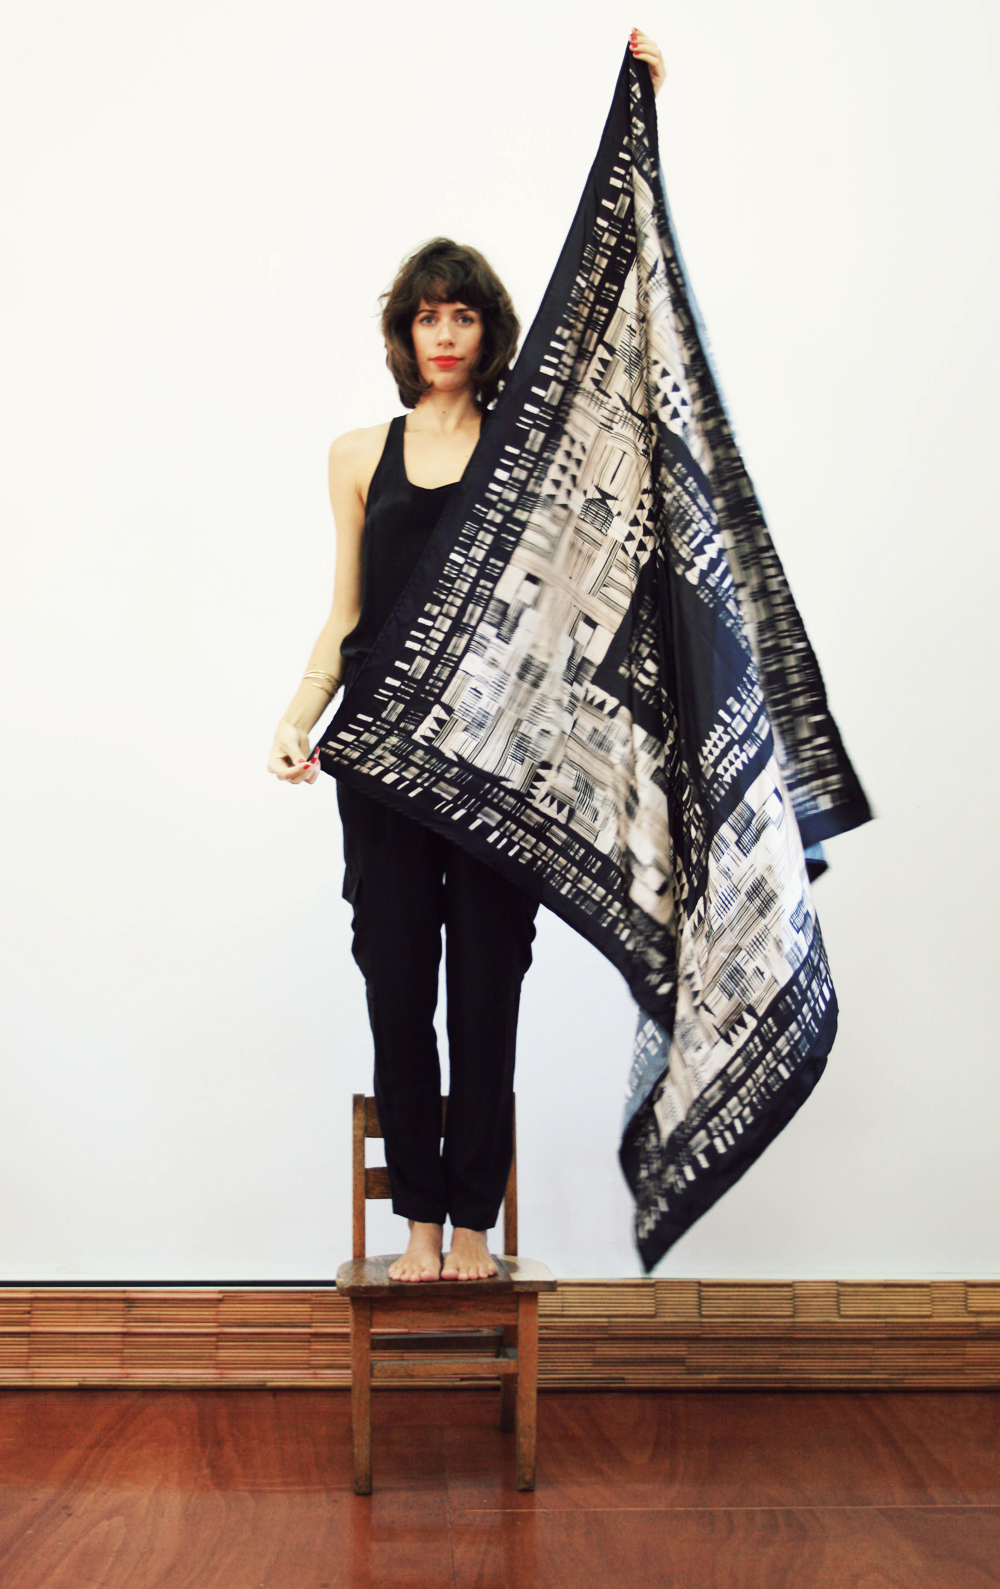 woking designs dealtry scarf collection sneak peek